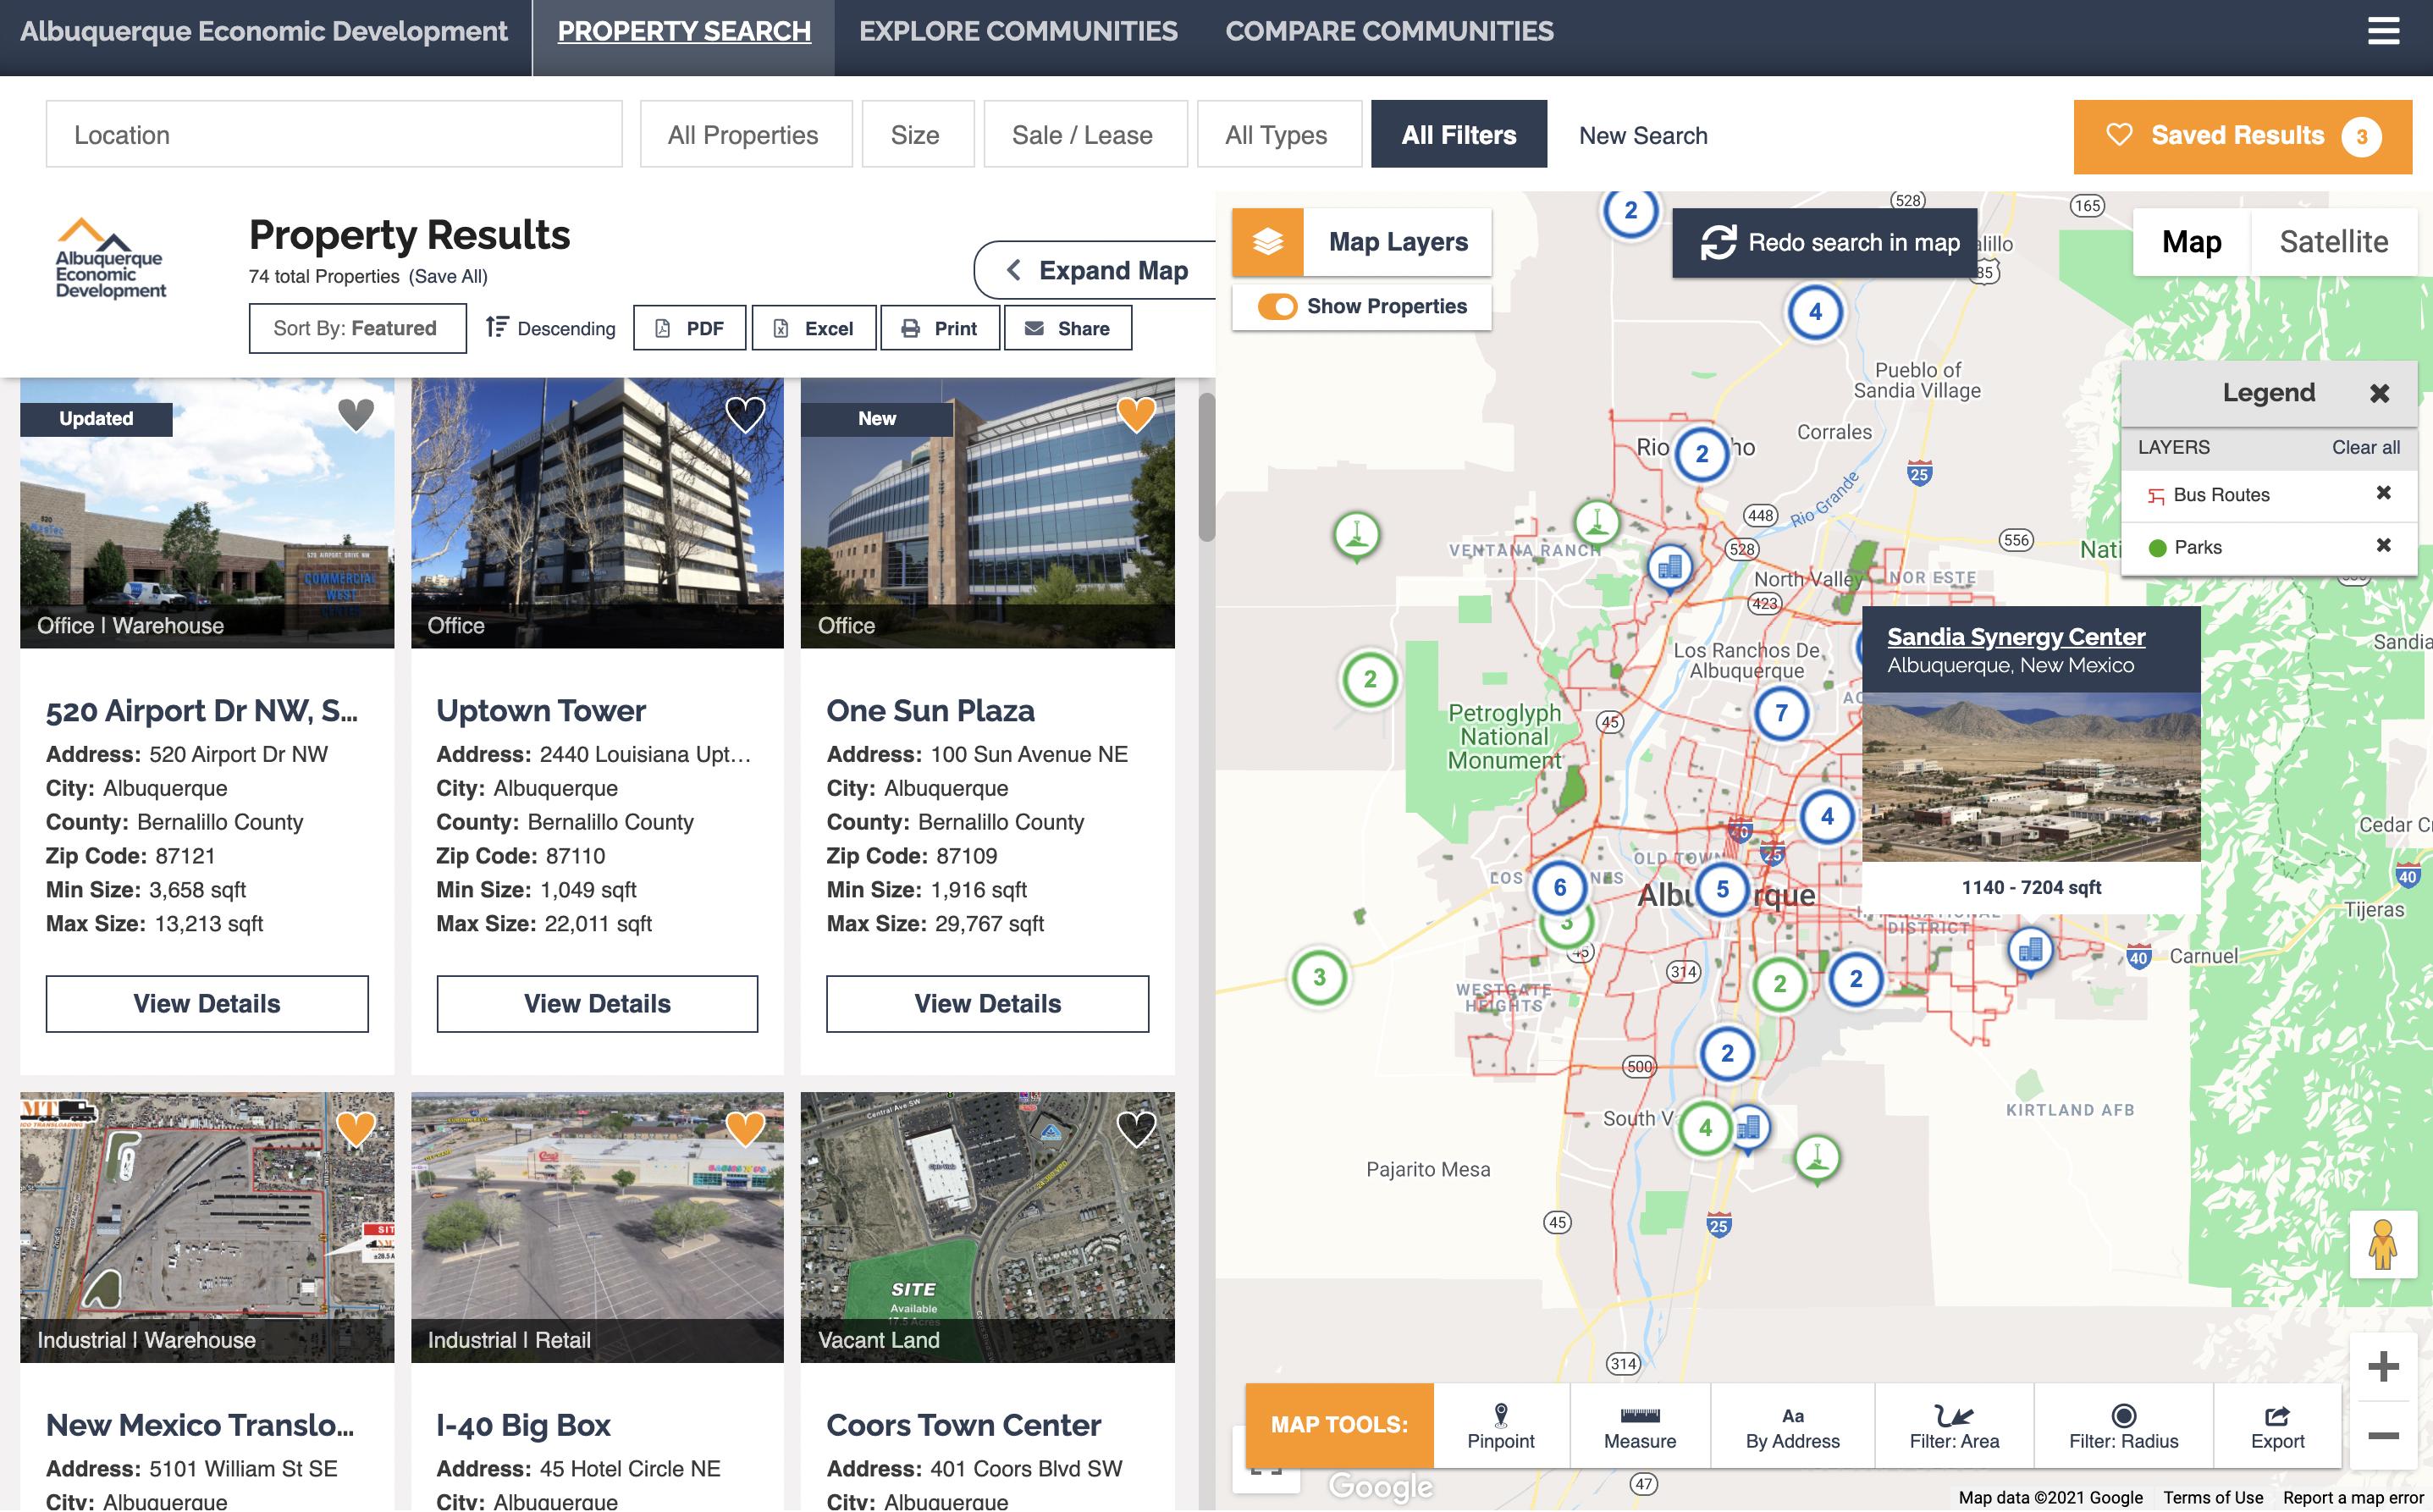 Albuquerque Economic Development New Mexico GIS data tool